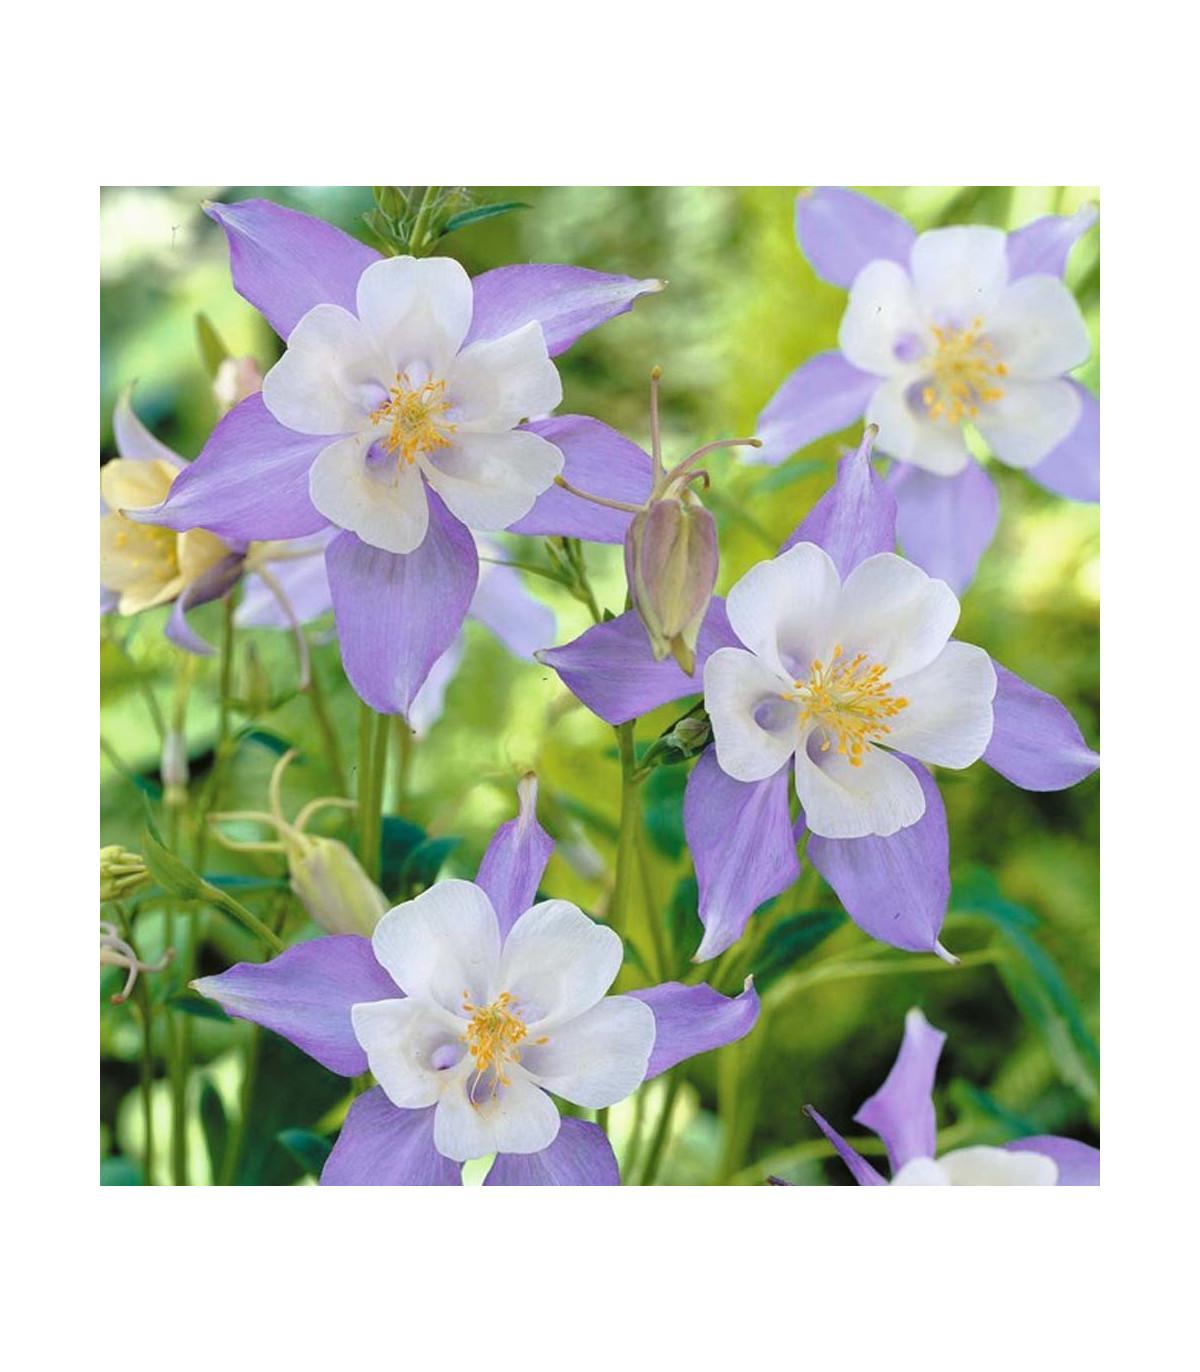 Orlíček zmes farieb - semená Orlíčka - Aquilegia caerulea - cca 140 ks